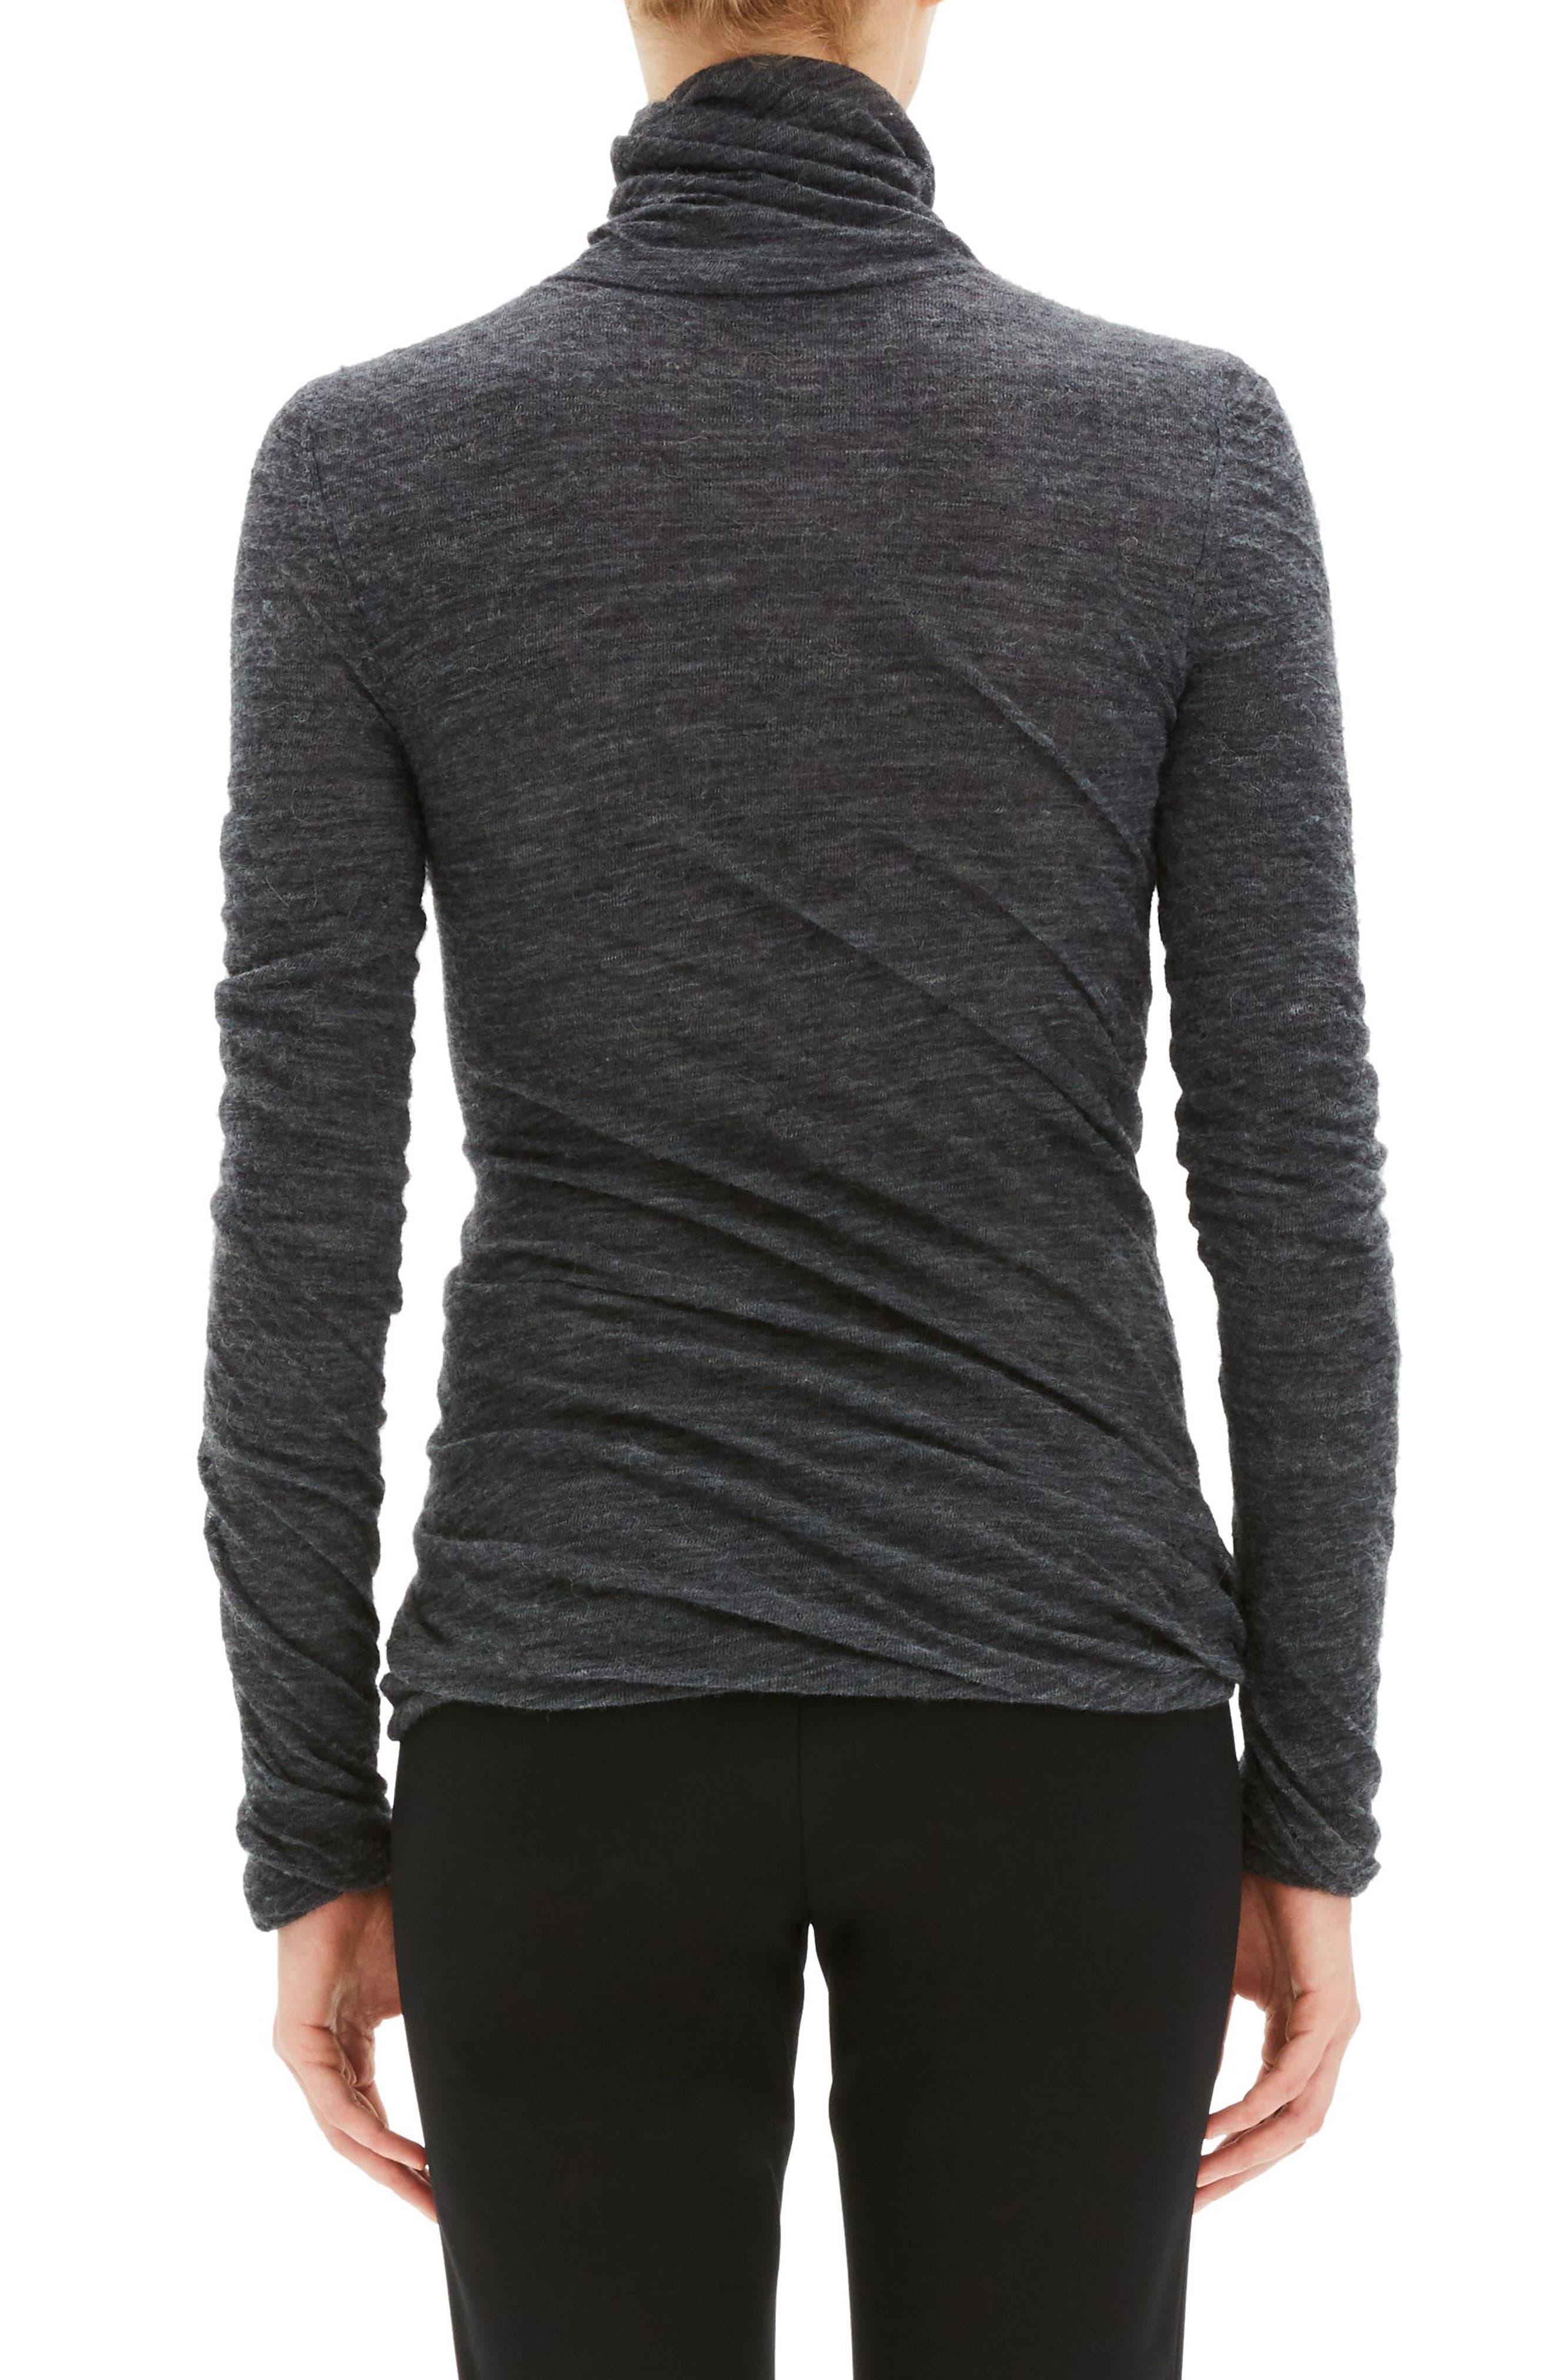 Twist Turtleneck Sweater,                             Alternate thumbnail 2, color,                             030